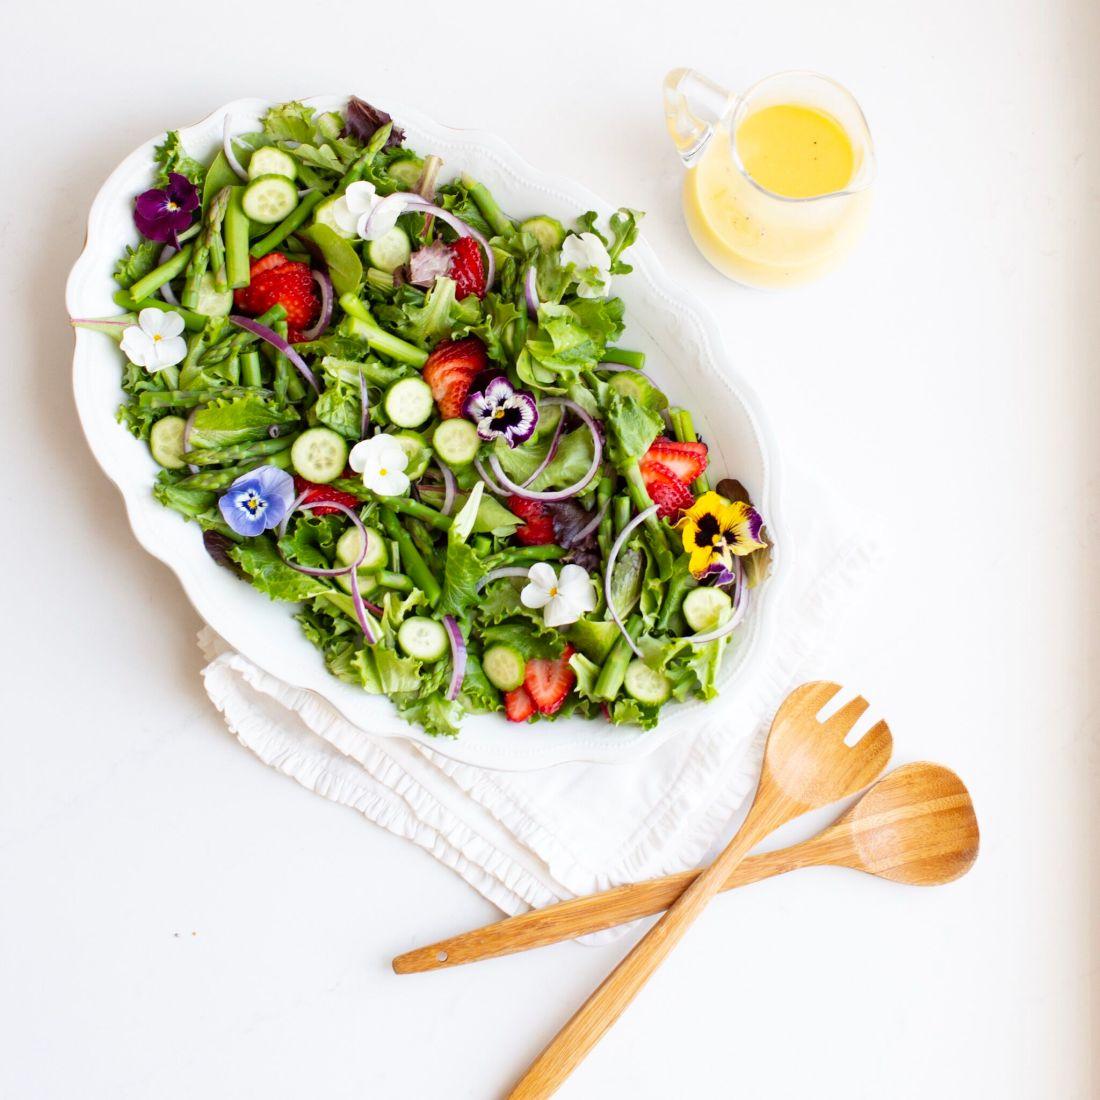 Spring Salad with edible flowers and creamy lemon vinaigrette.